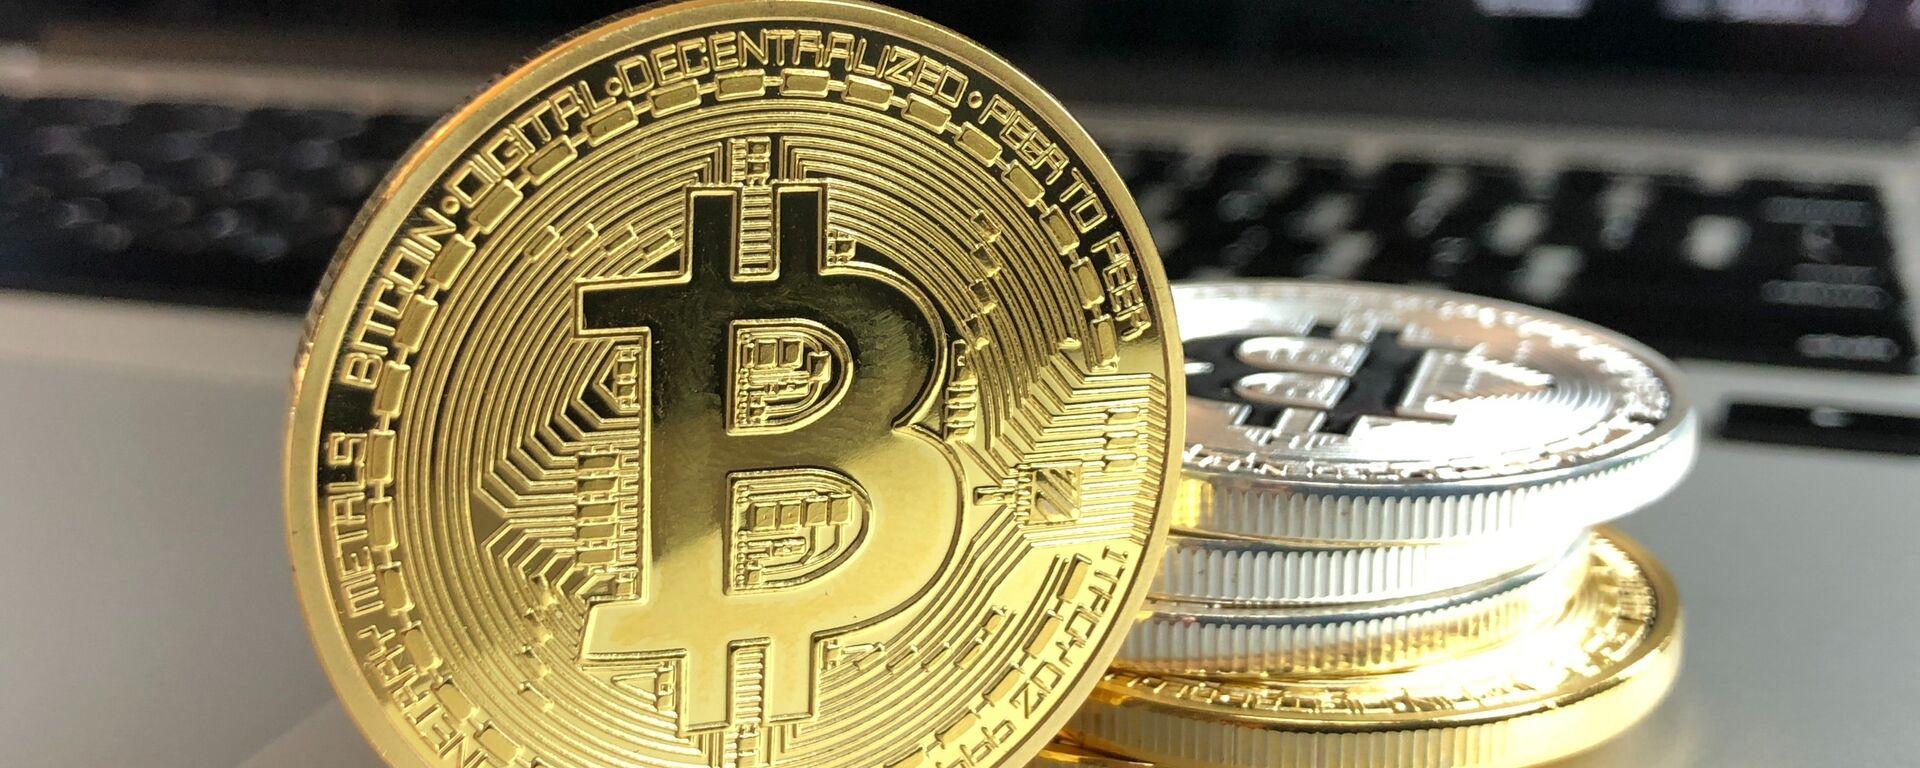 Bitcoin, moneda criptográfica - Sputnik Mundo, 1920, 12.06.2021